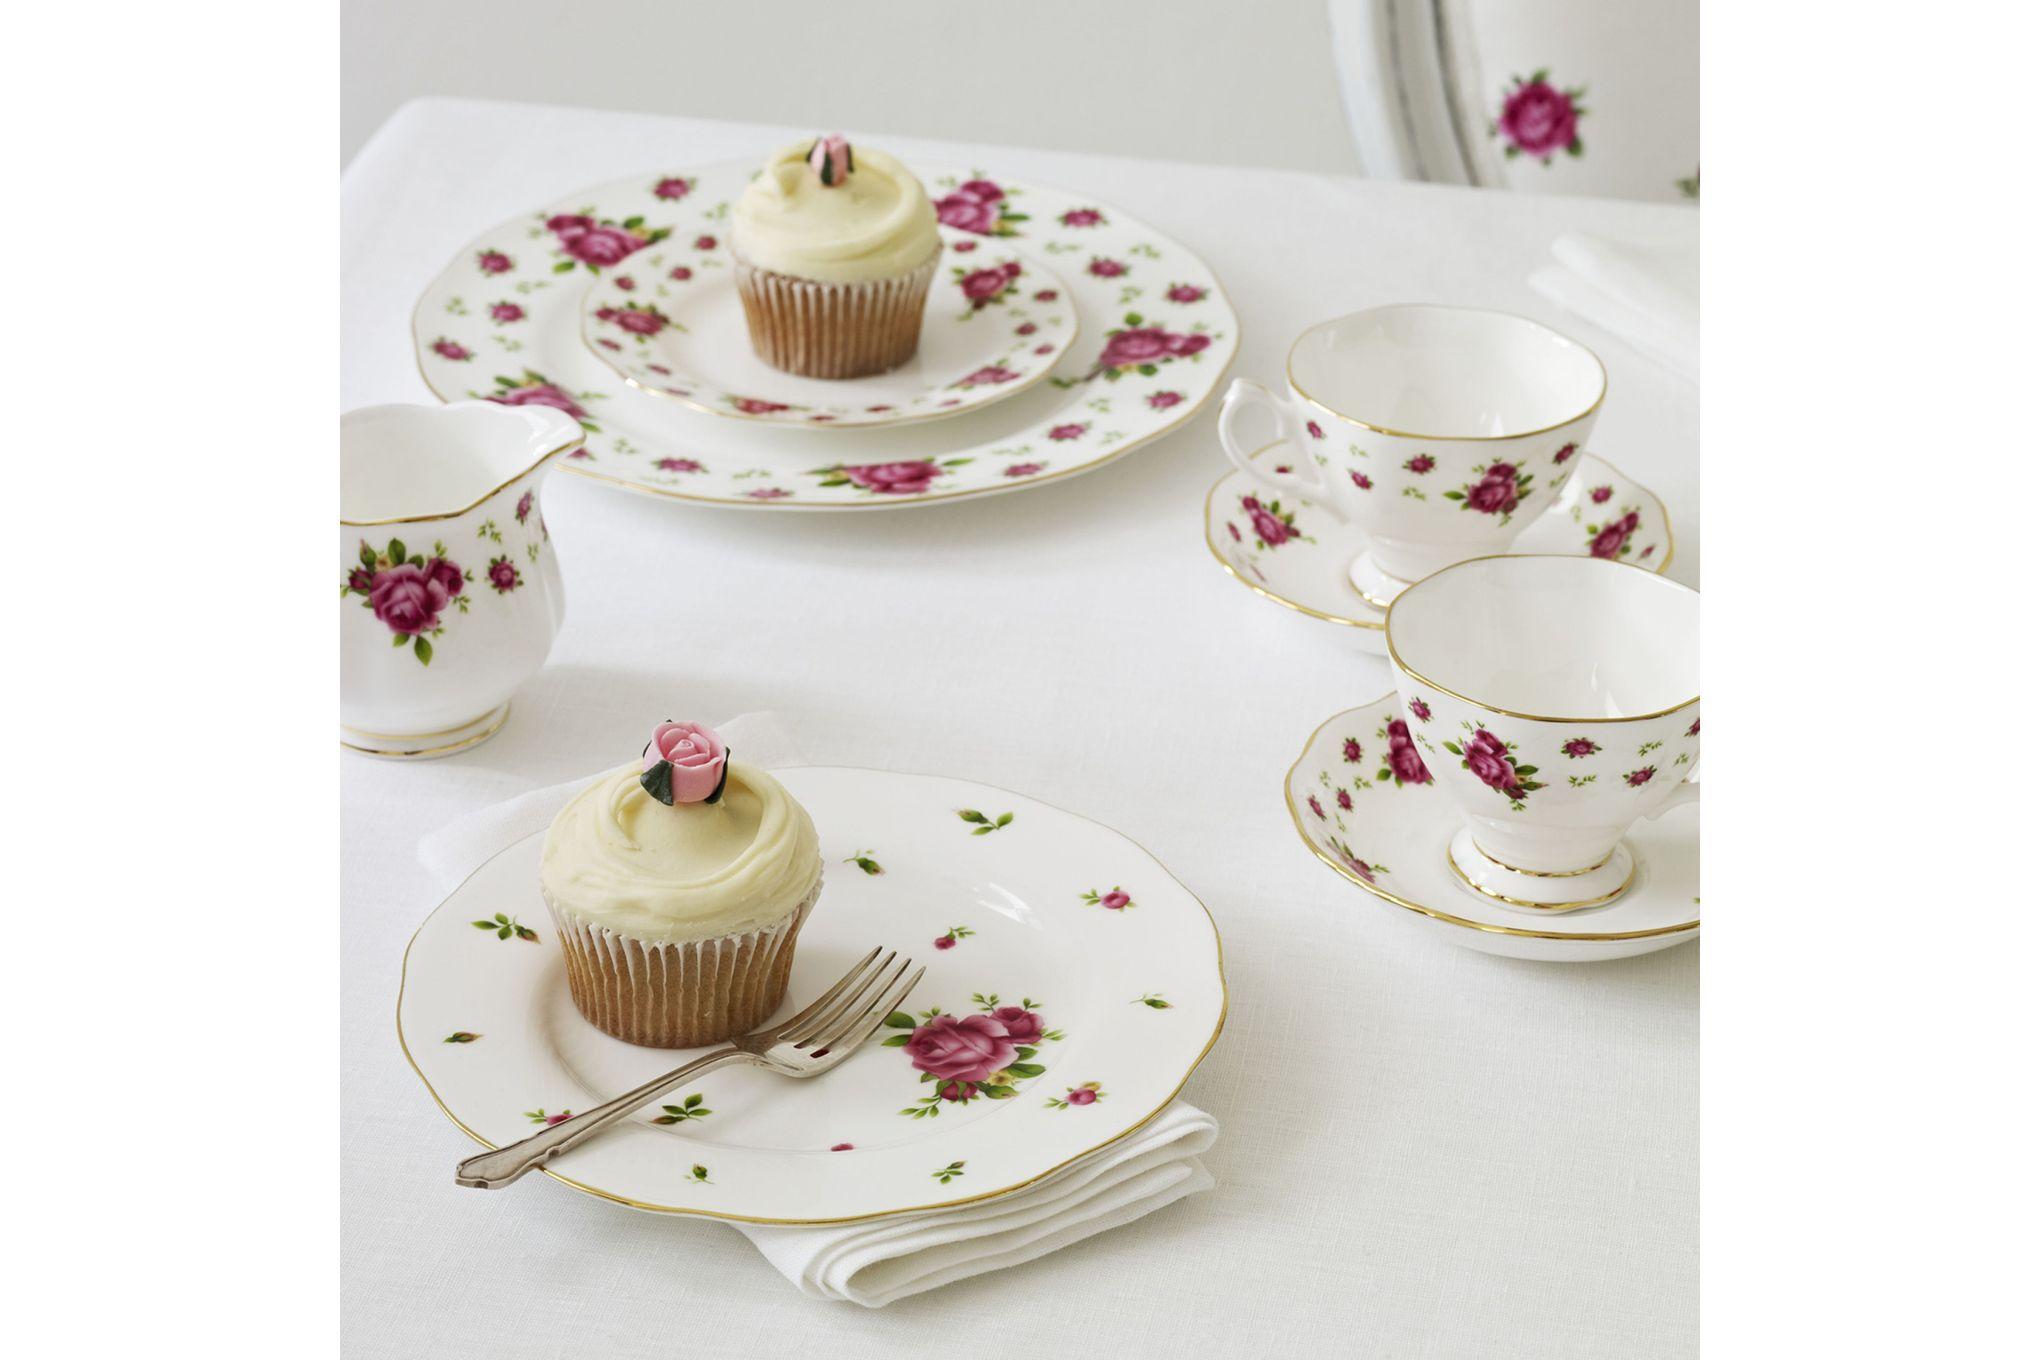 Royal Albert New Country Roses White 3 Piece Tea set Teapot, Sugar, Creamer thumb 3